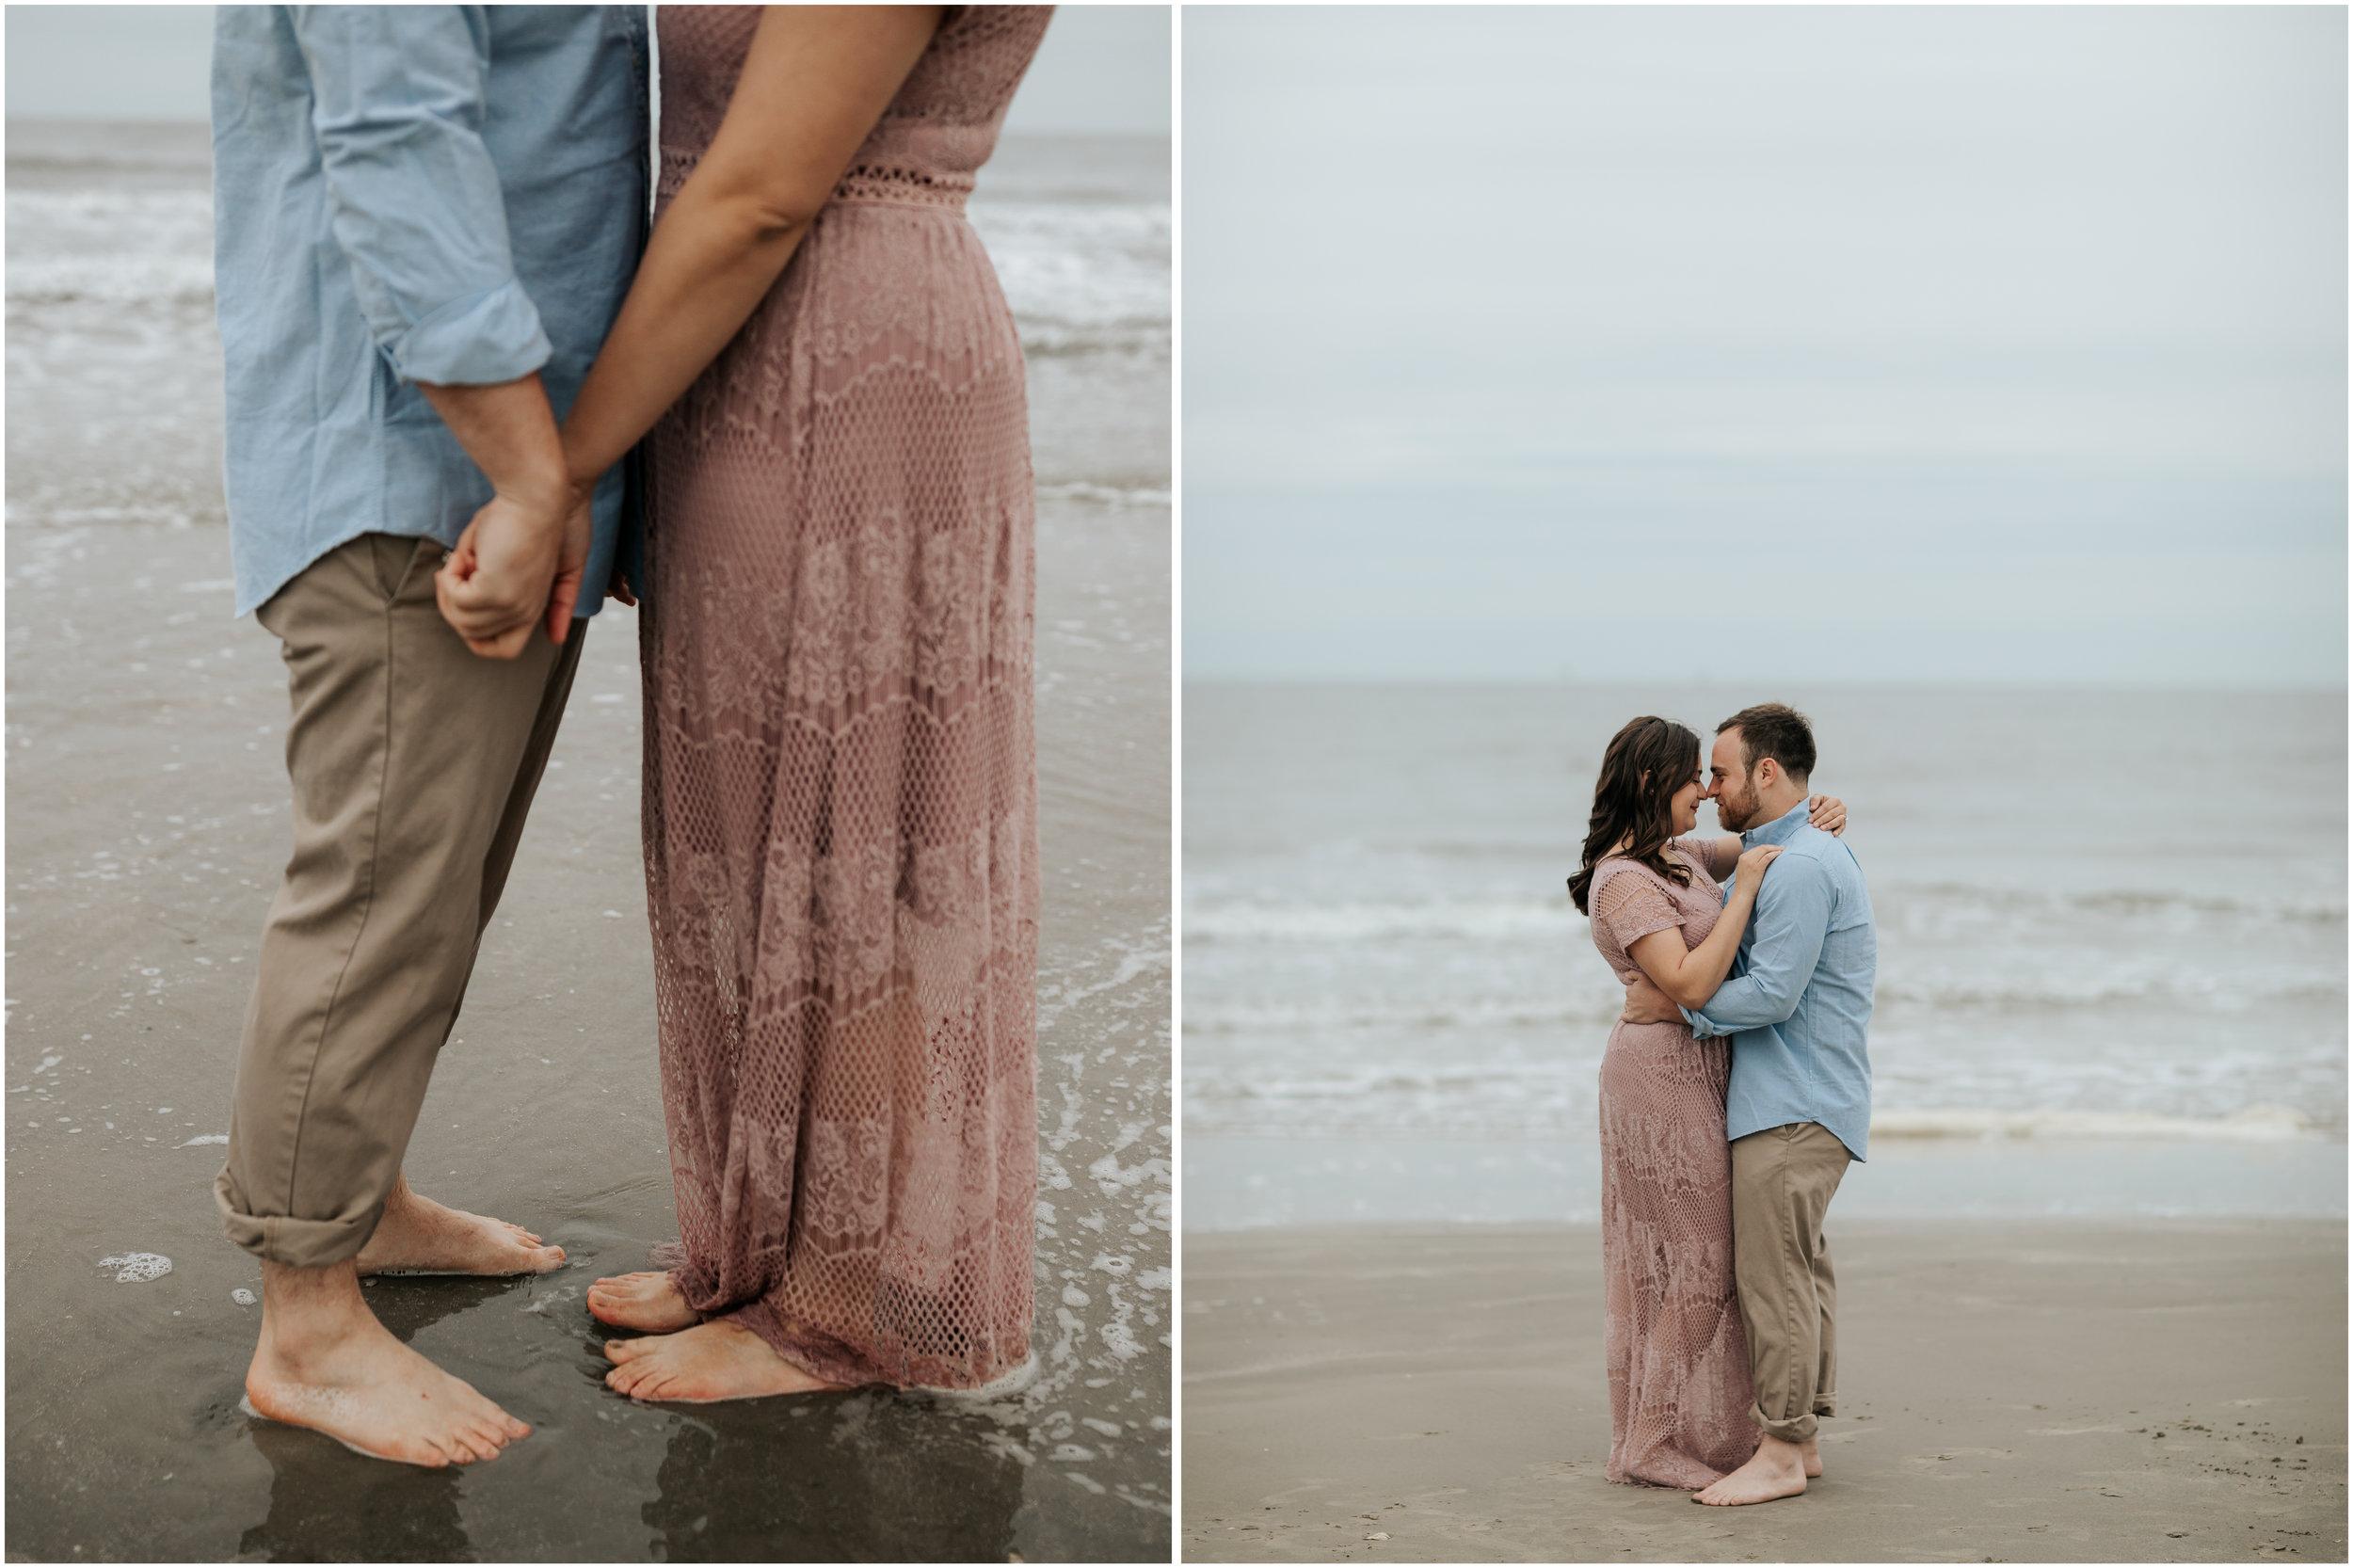 Leah Nicole Photography - Houston Wedding Photographer-Glassel Art School Engagement Session- Houston Wedding Photographer - Galveston Engagement 3.jpg